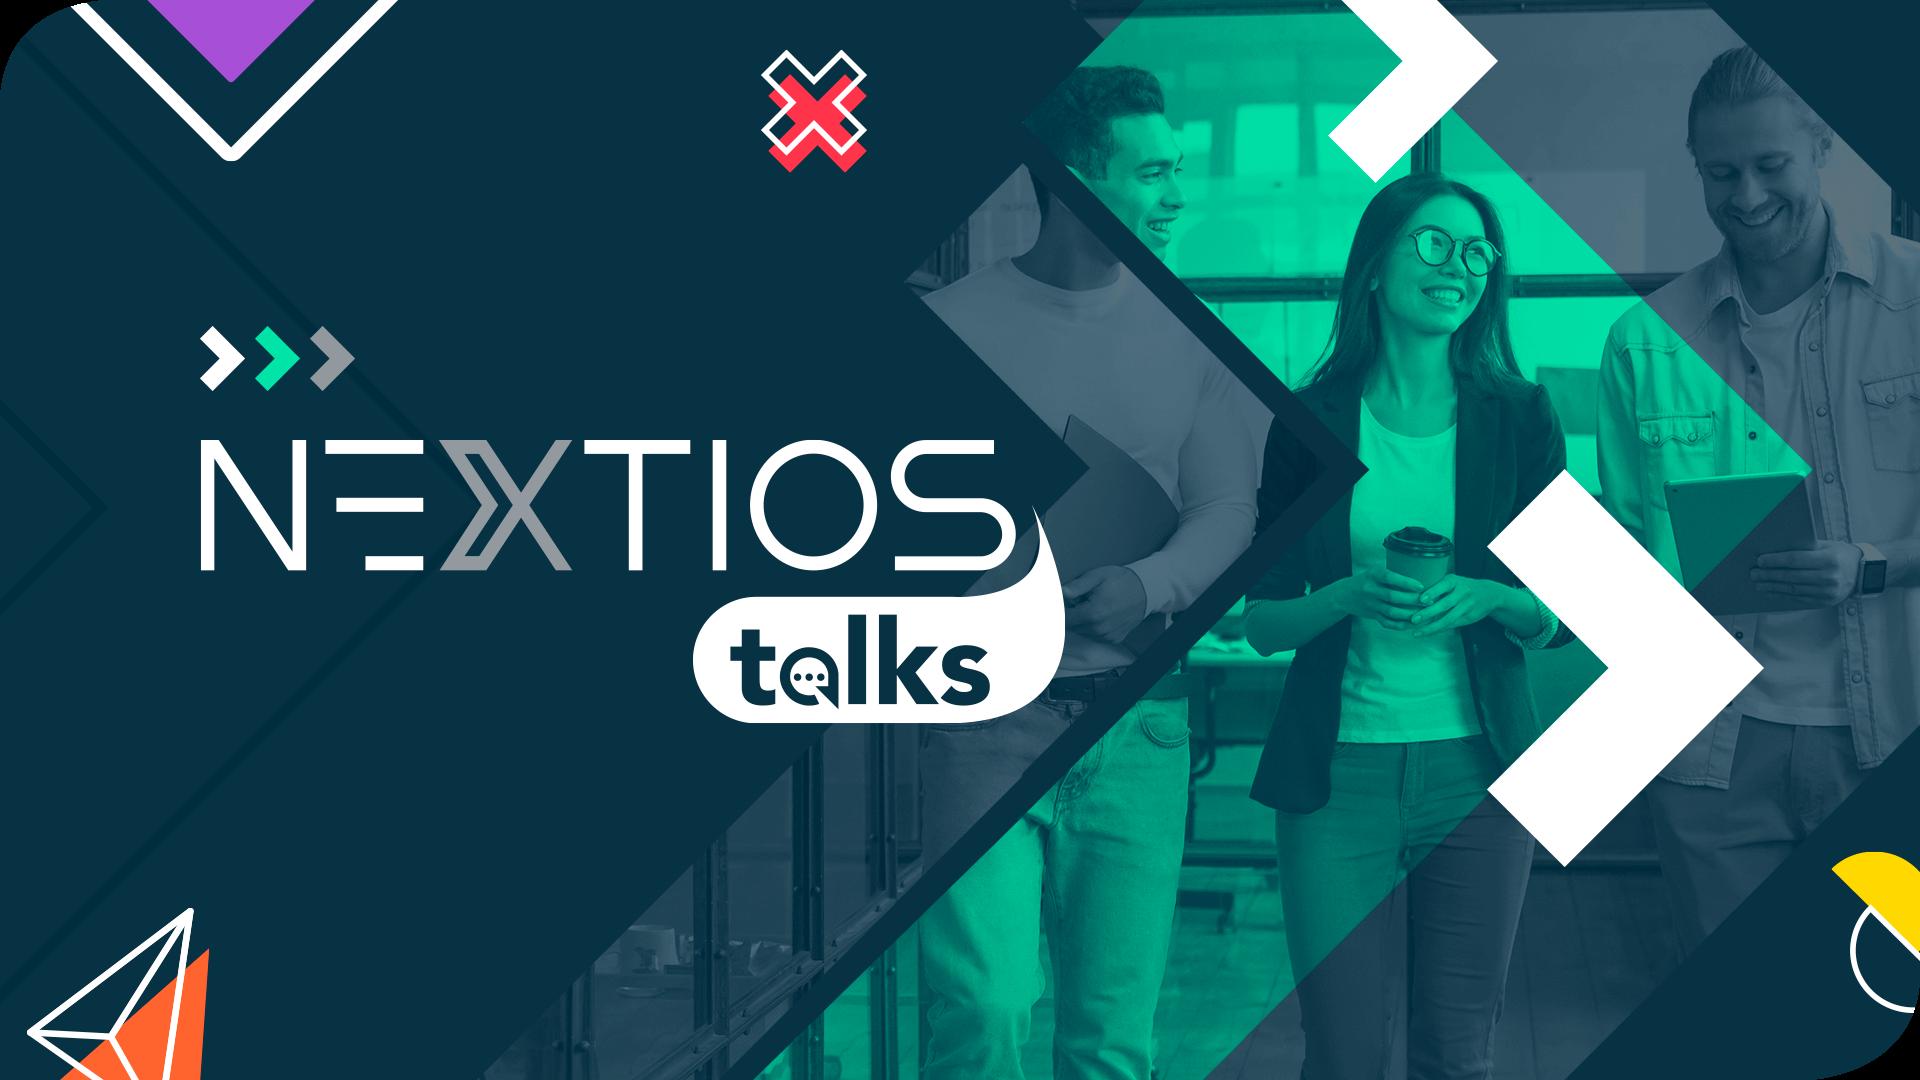 Nextios Talks